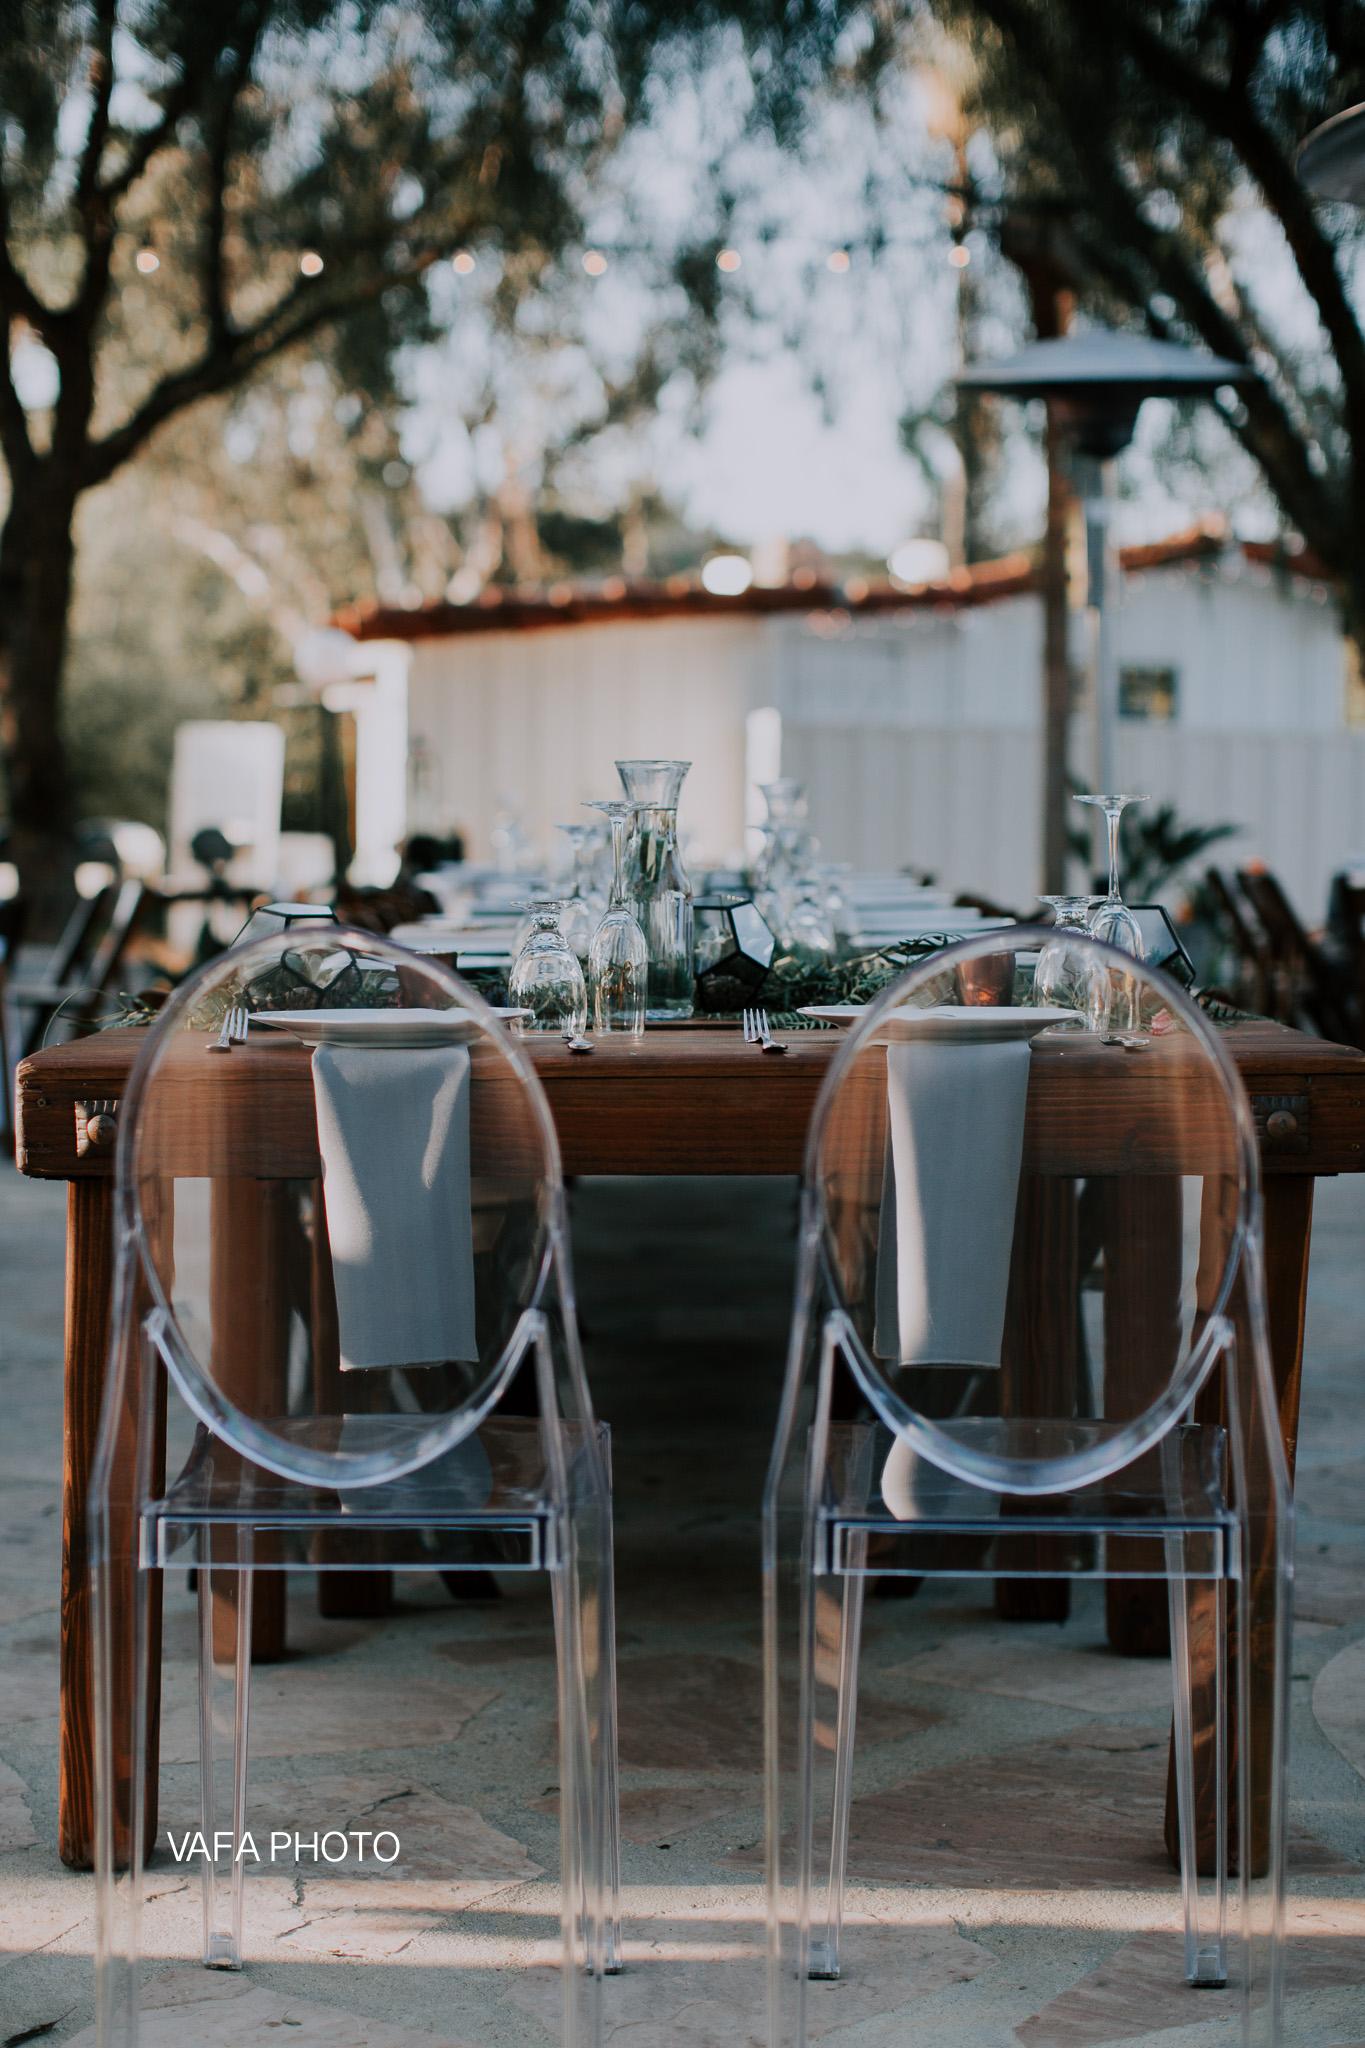 Leo-Carrillo-Ranch-Wedding-Lauren-Mike-Vafa-Photo-451.jpg